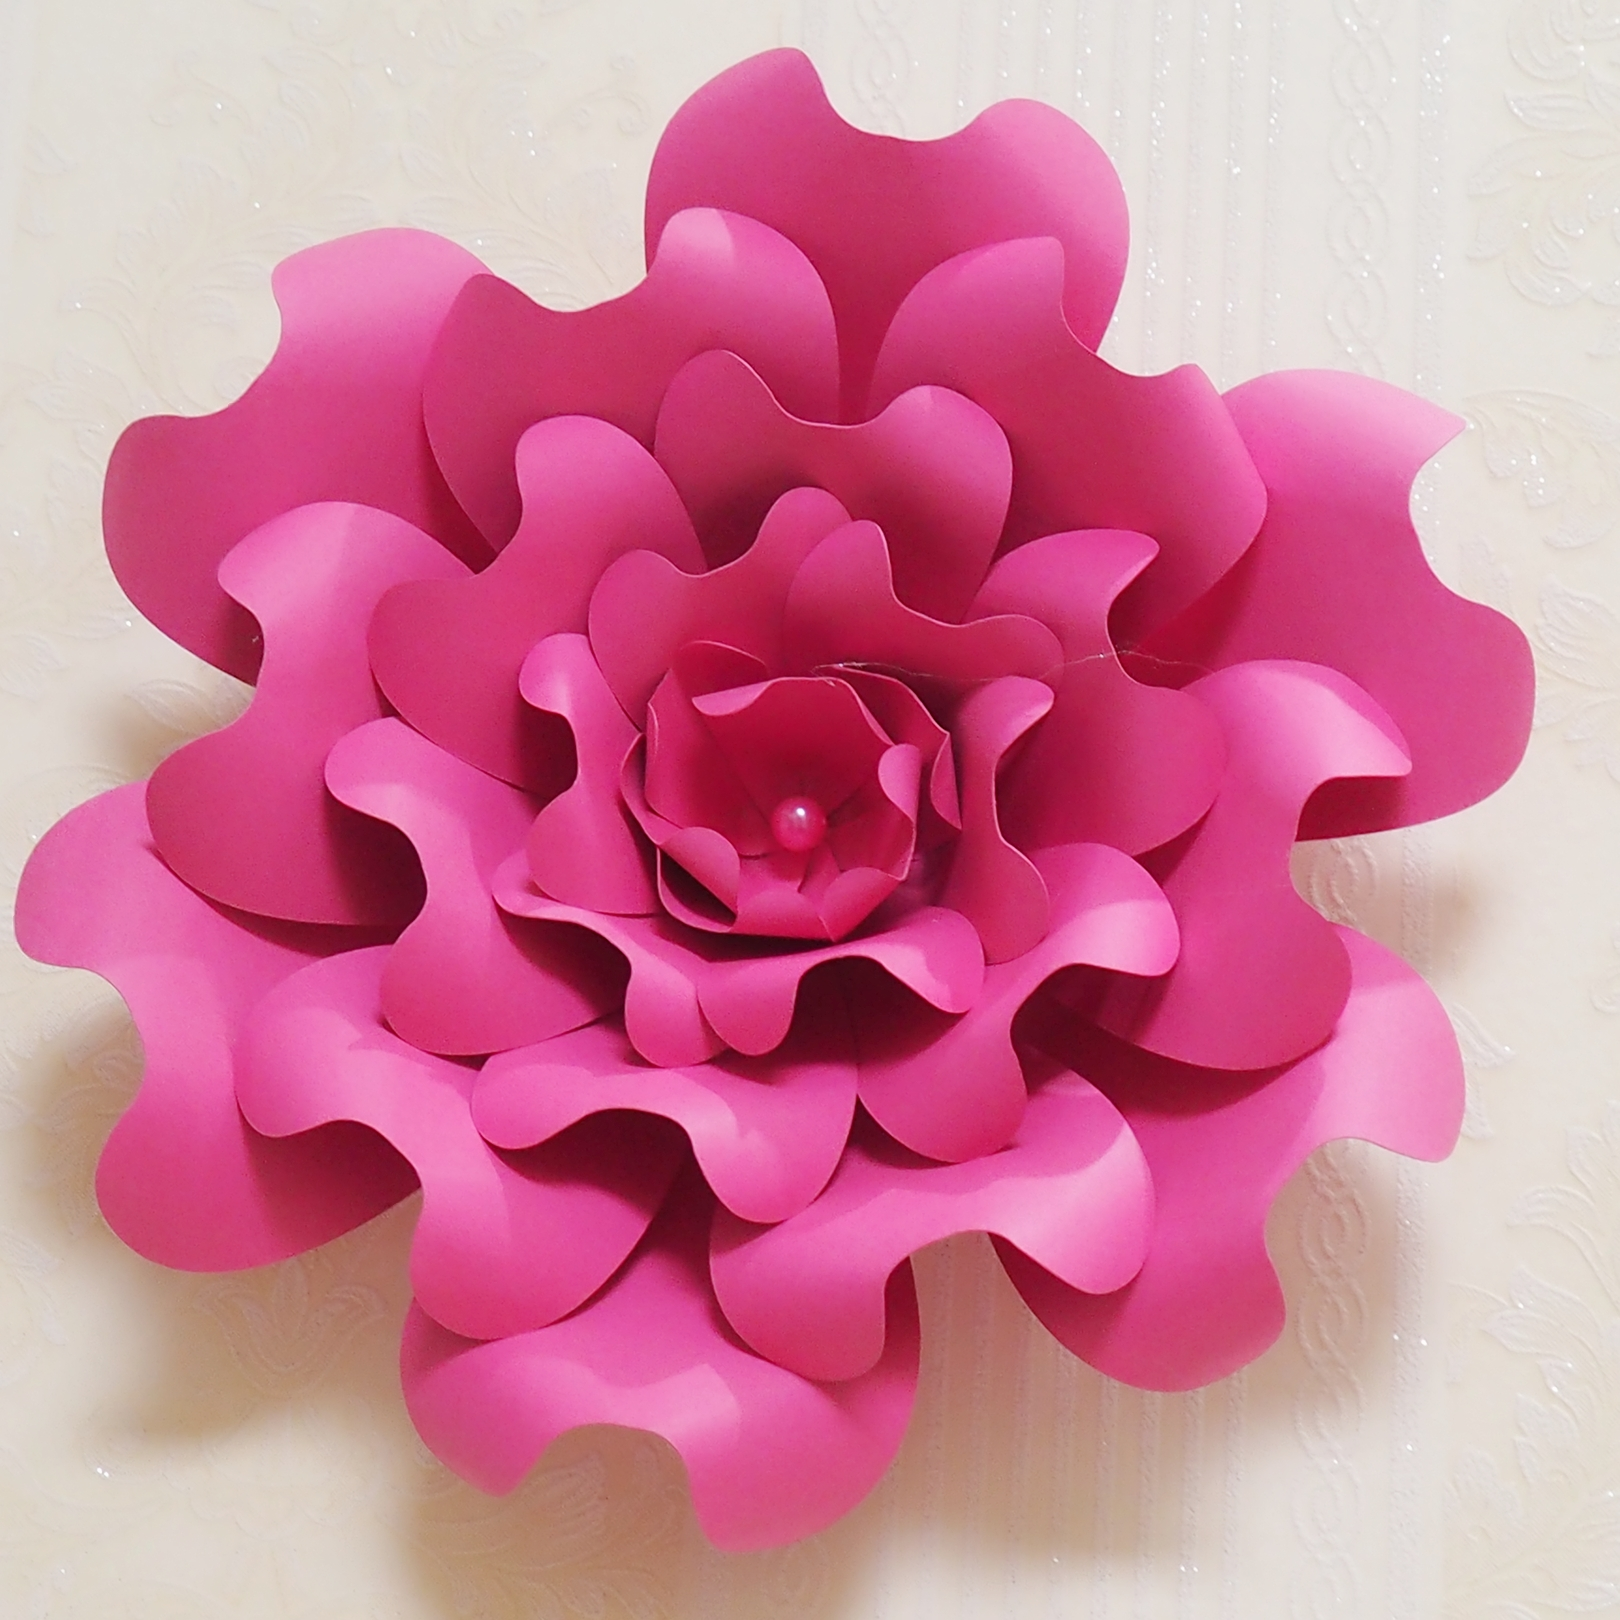 2018 Creative Giant Paper Flowers 9pcs Leaves 8 Pcs Half Made Kits